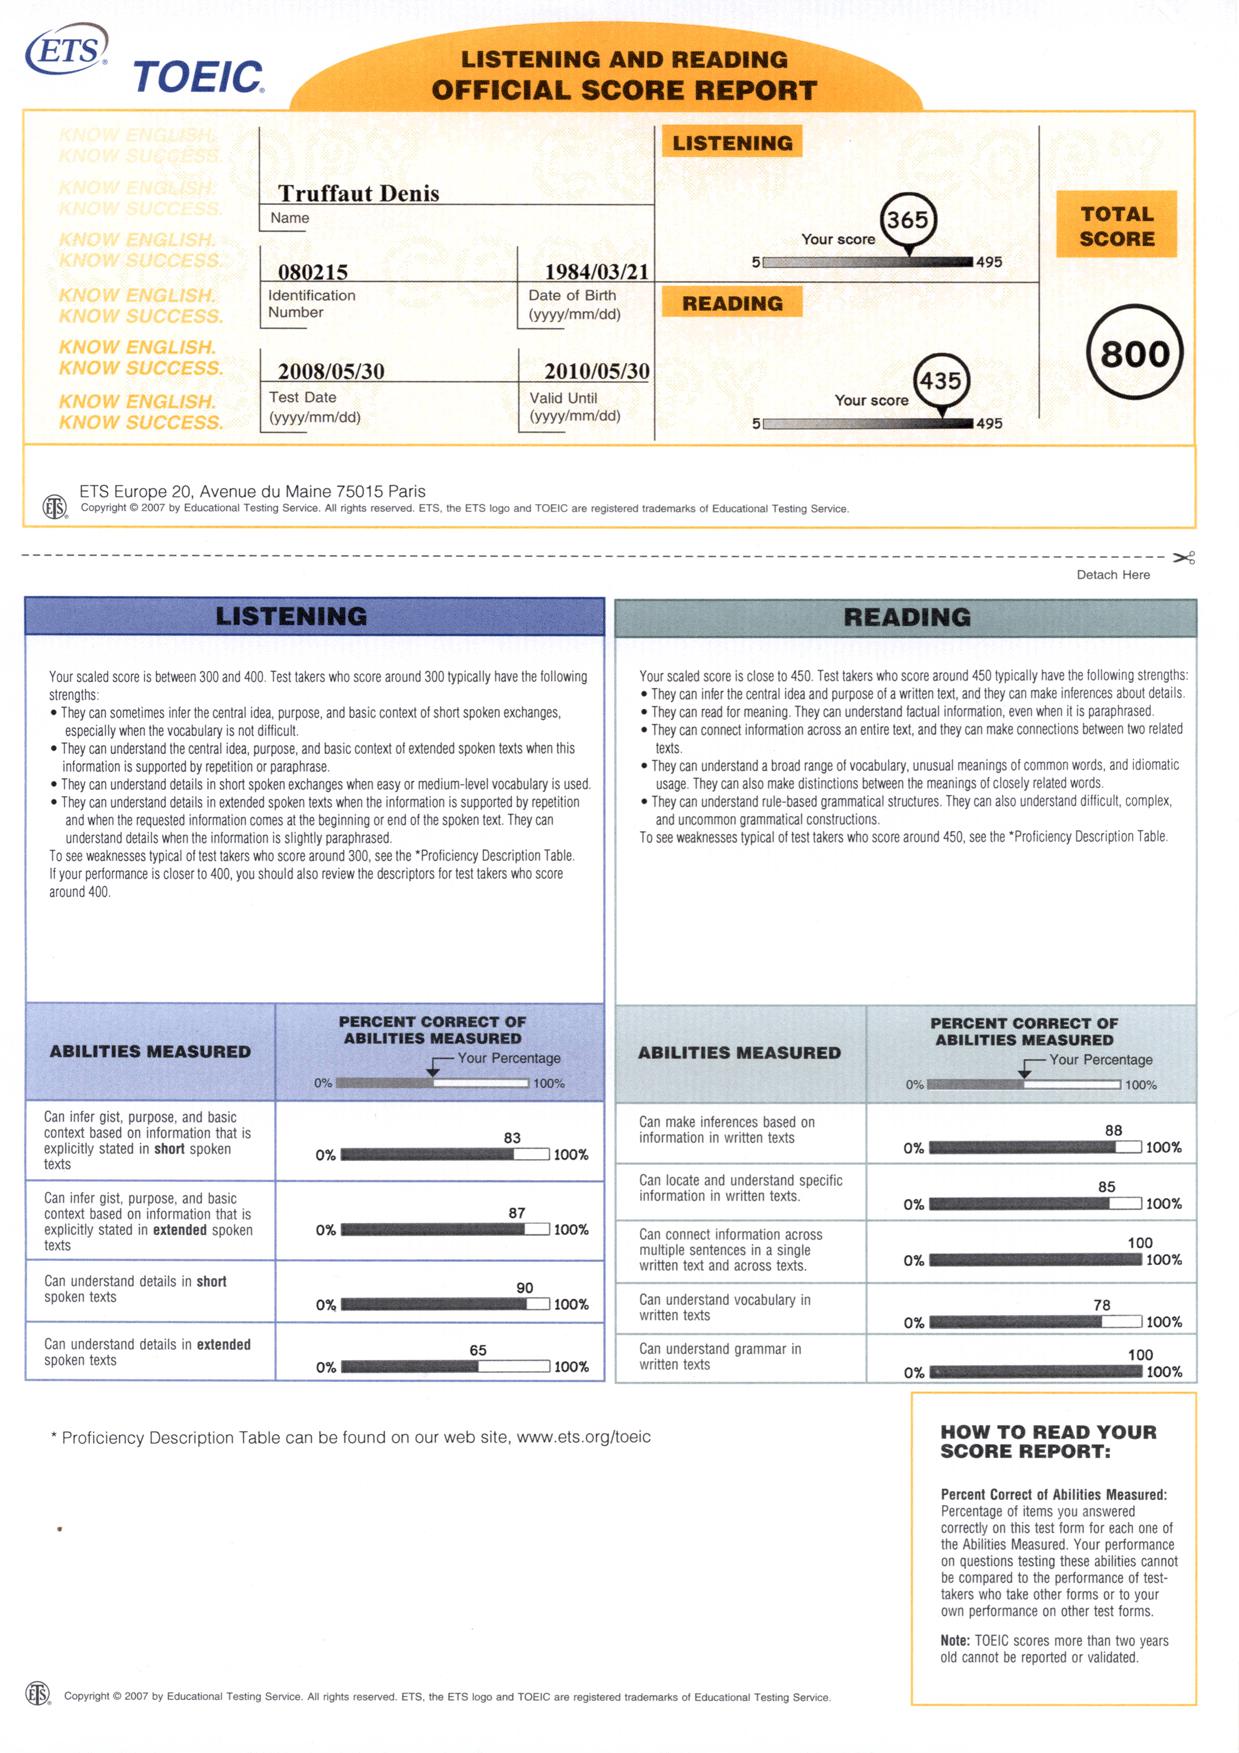 denis truffaut certifications scrum master ceseo php mysql html. Black Bedroom Furniture Sets. Home Design Ideas